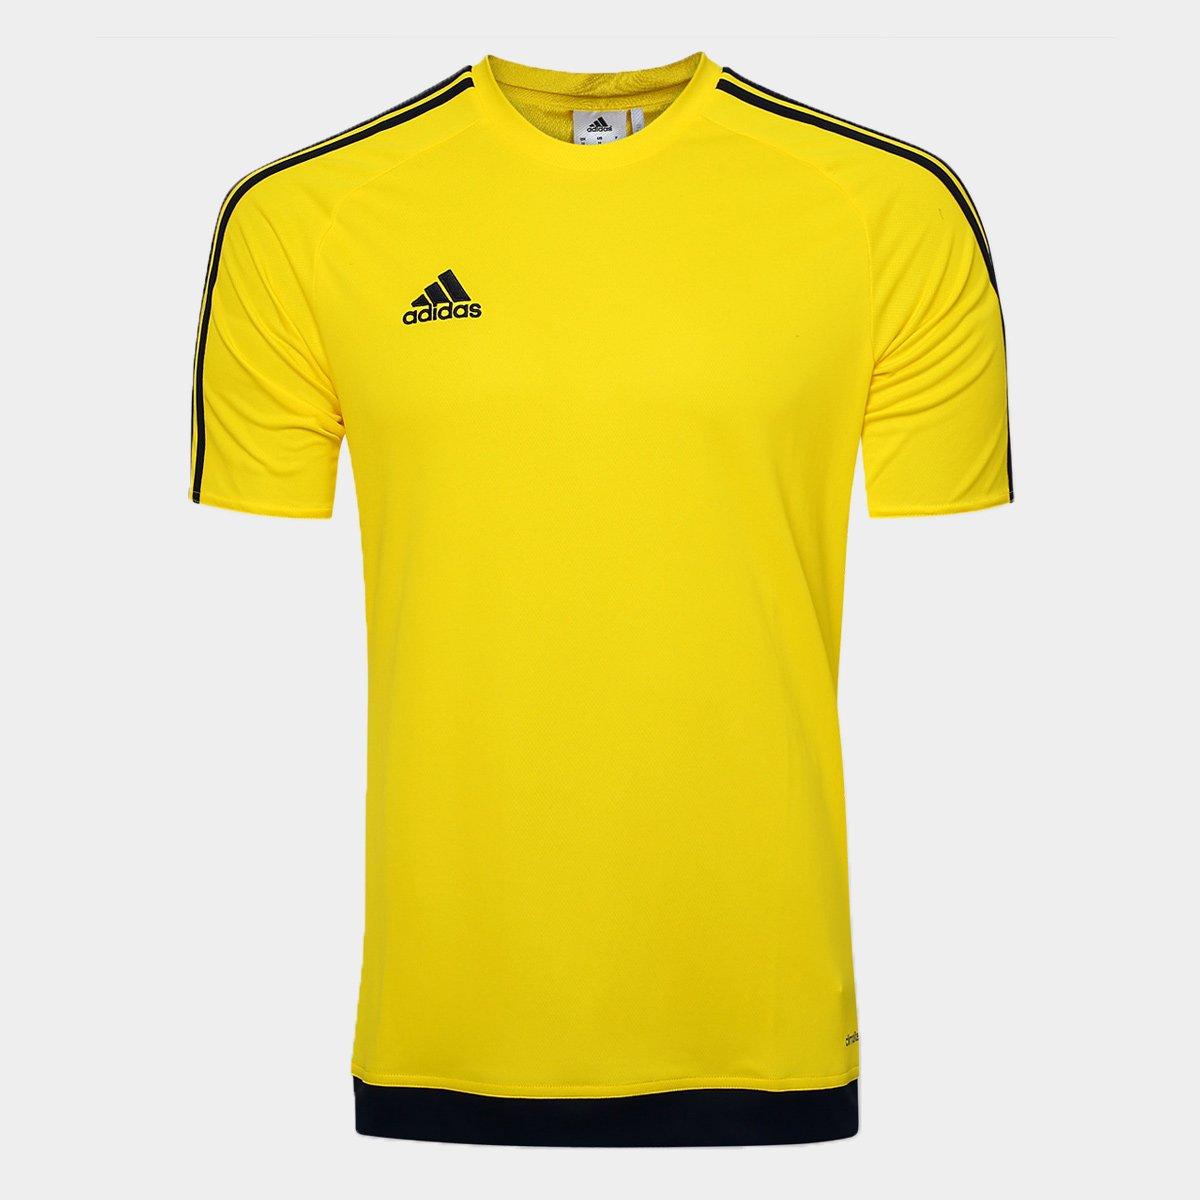 30ee0544c750d Camisa Adidas Estro 15 Masculina - Amarelo - Compre Agora